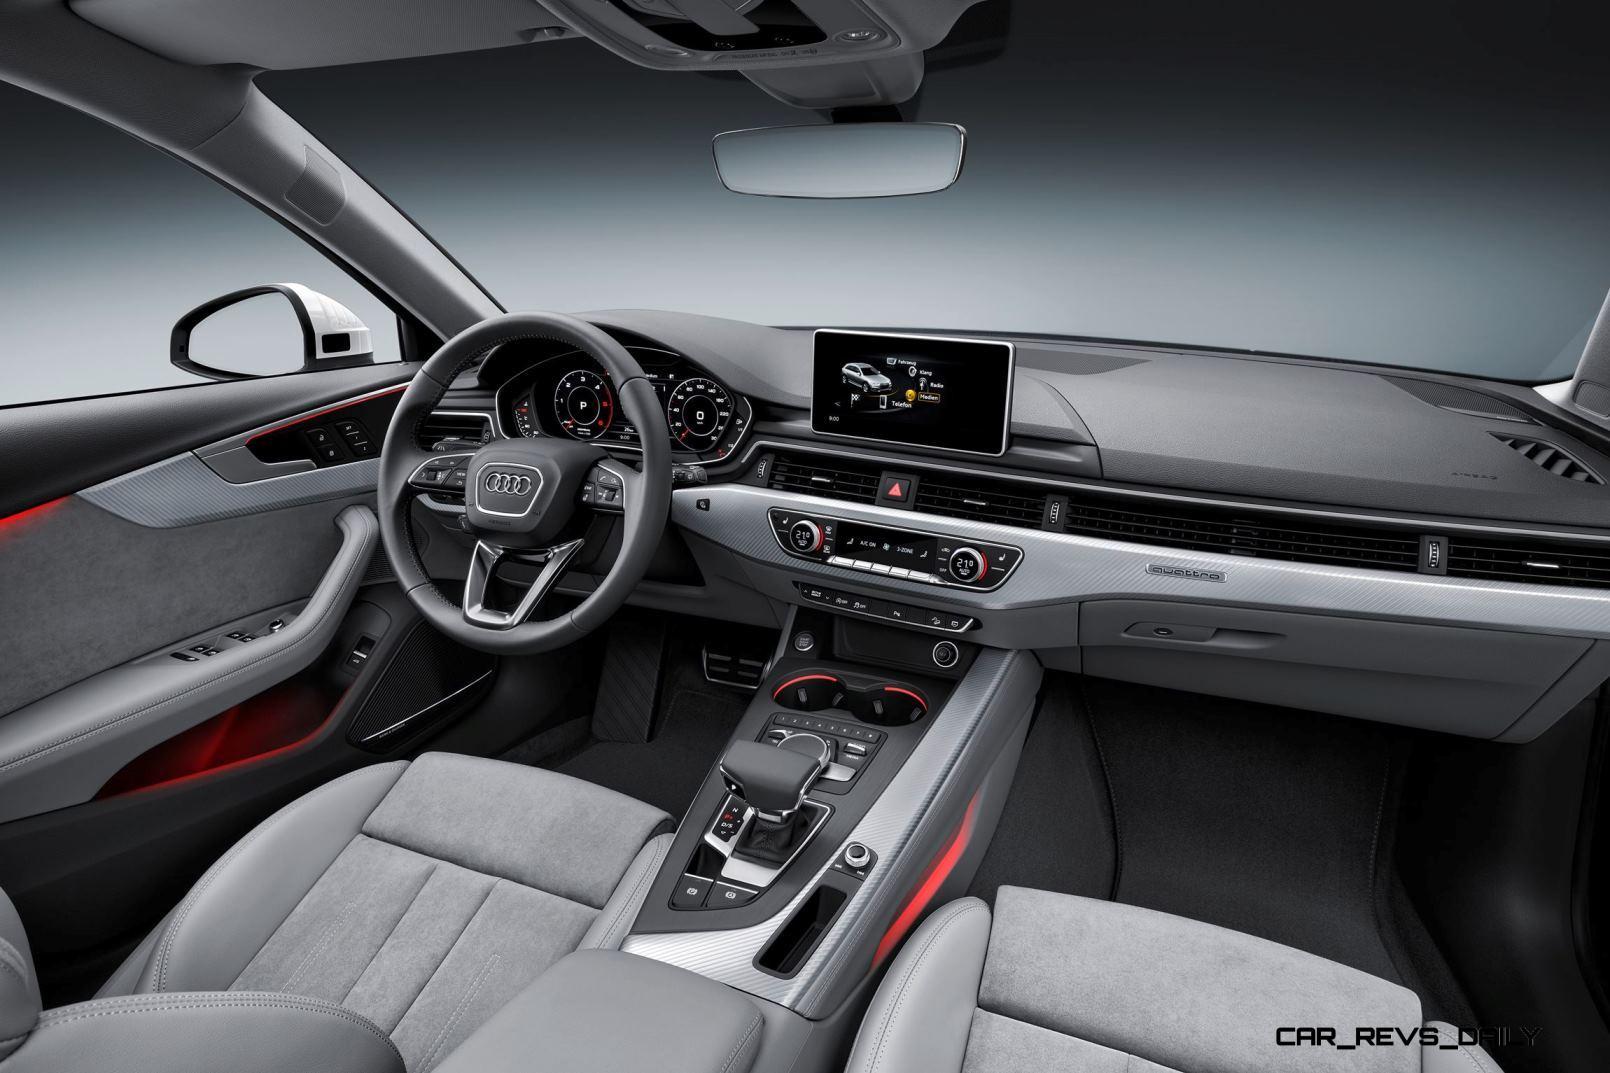 2017 Audi A4 Allroad 50k Ski Wagon Set For Fall 2016 Usa